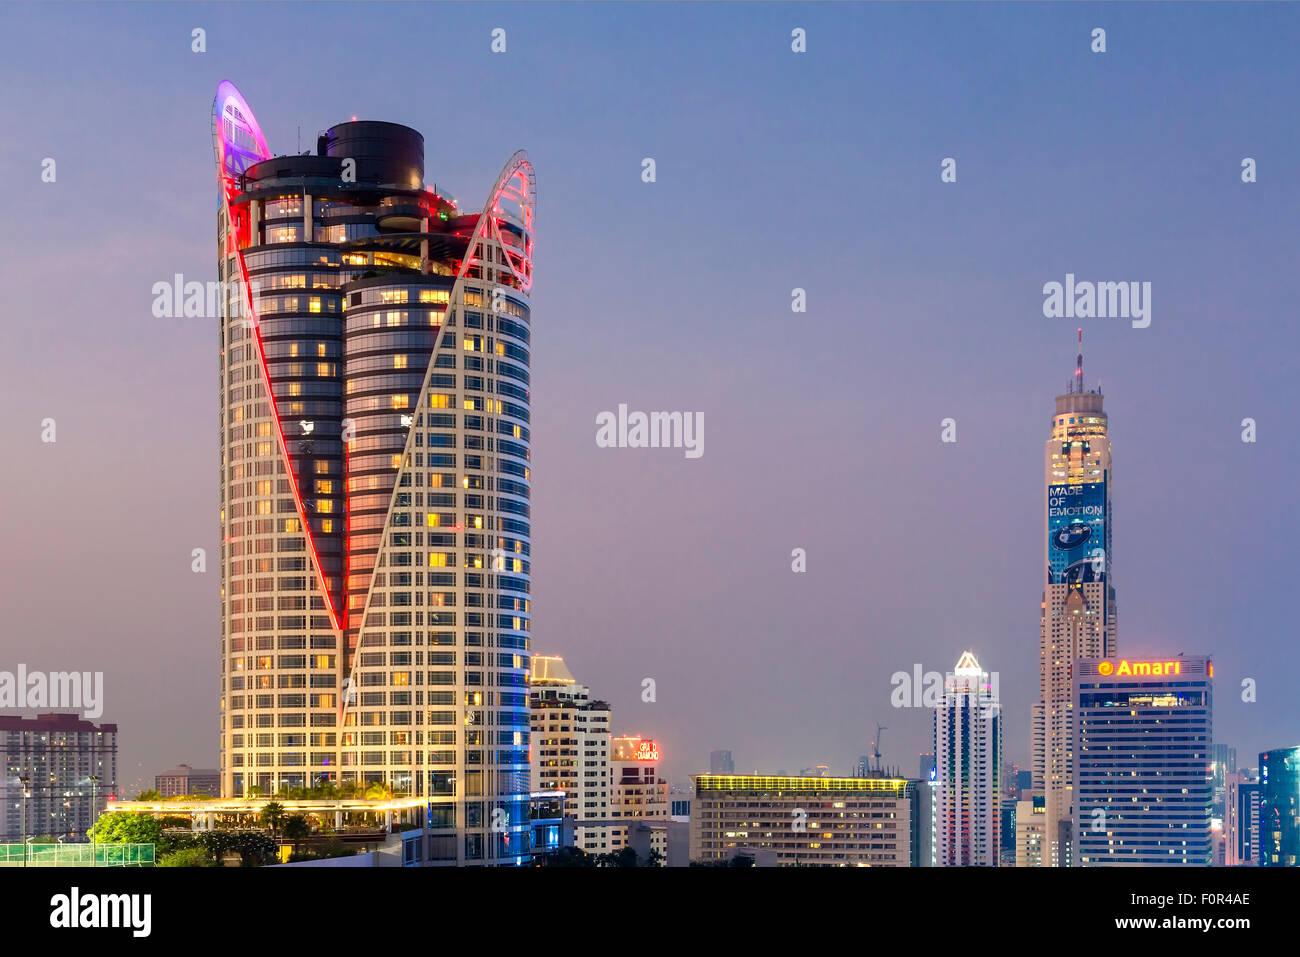 Mit Centara Grand Tower und Baiyoke Sky Hotel Bangkok Skyline Stockbild